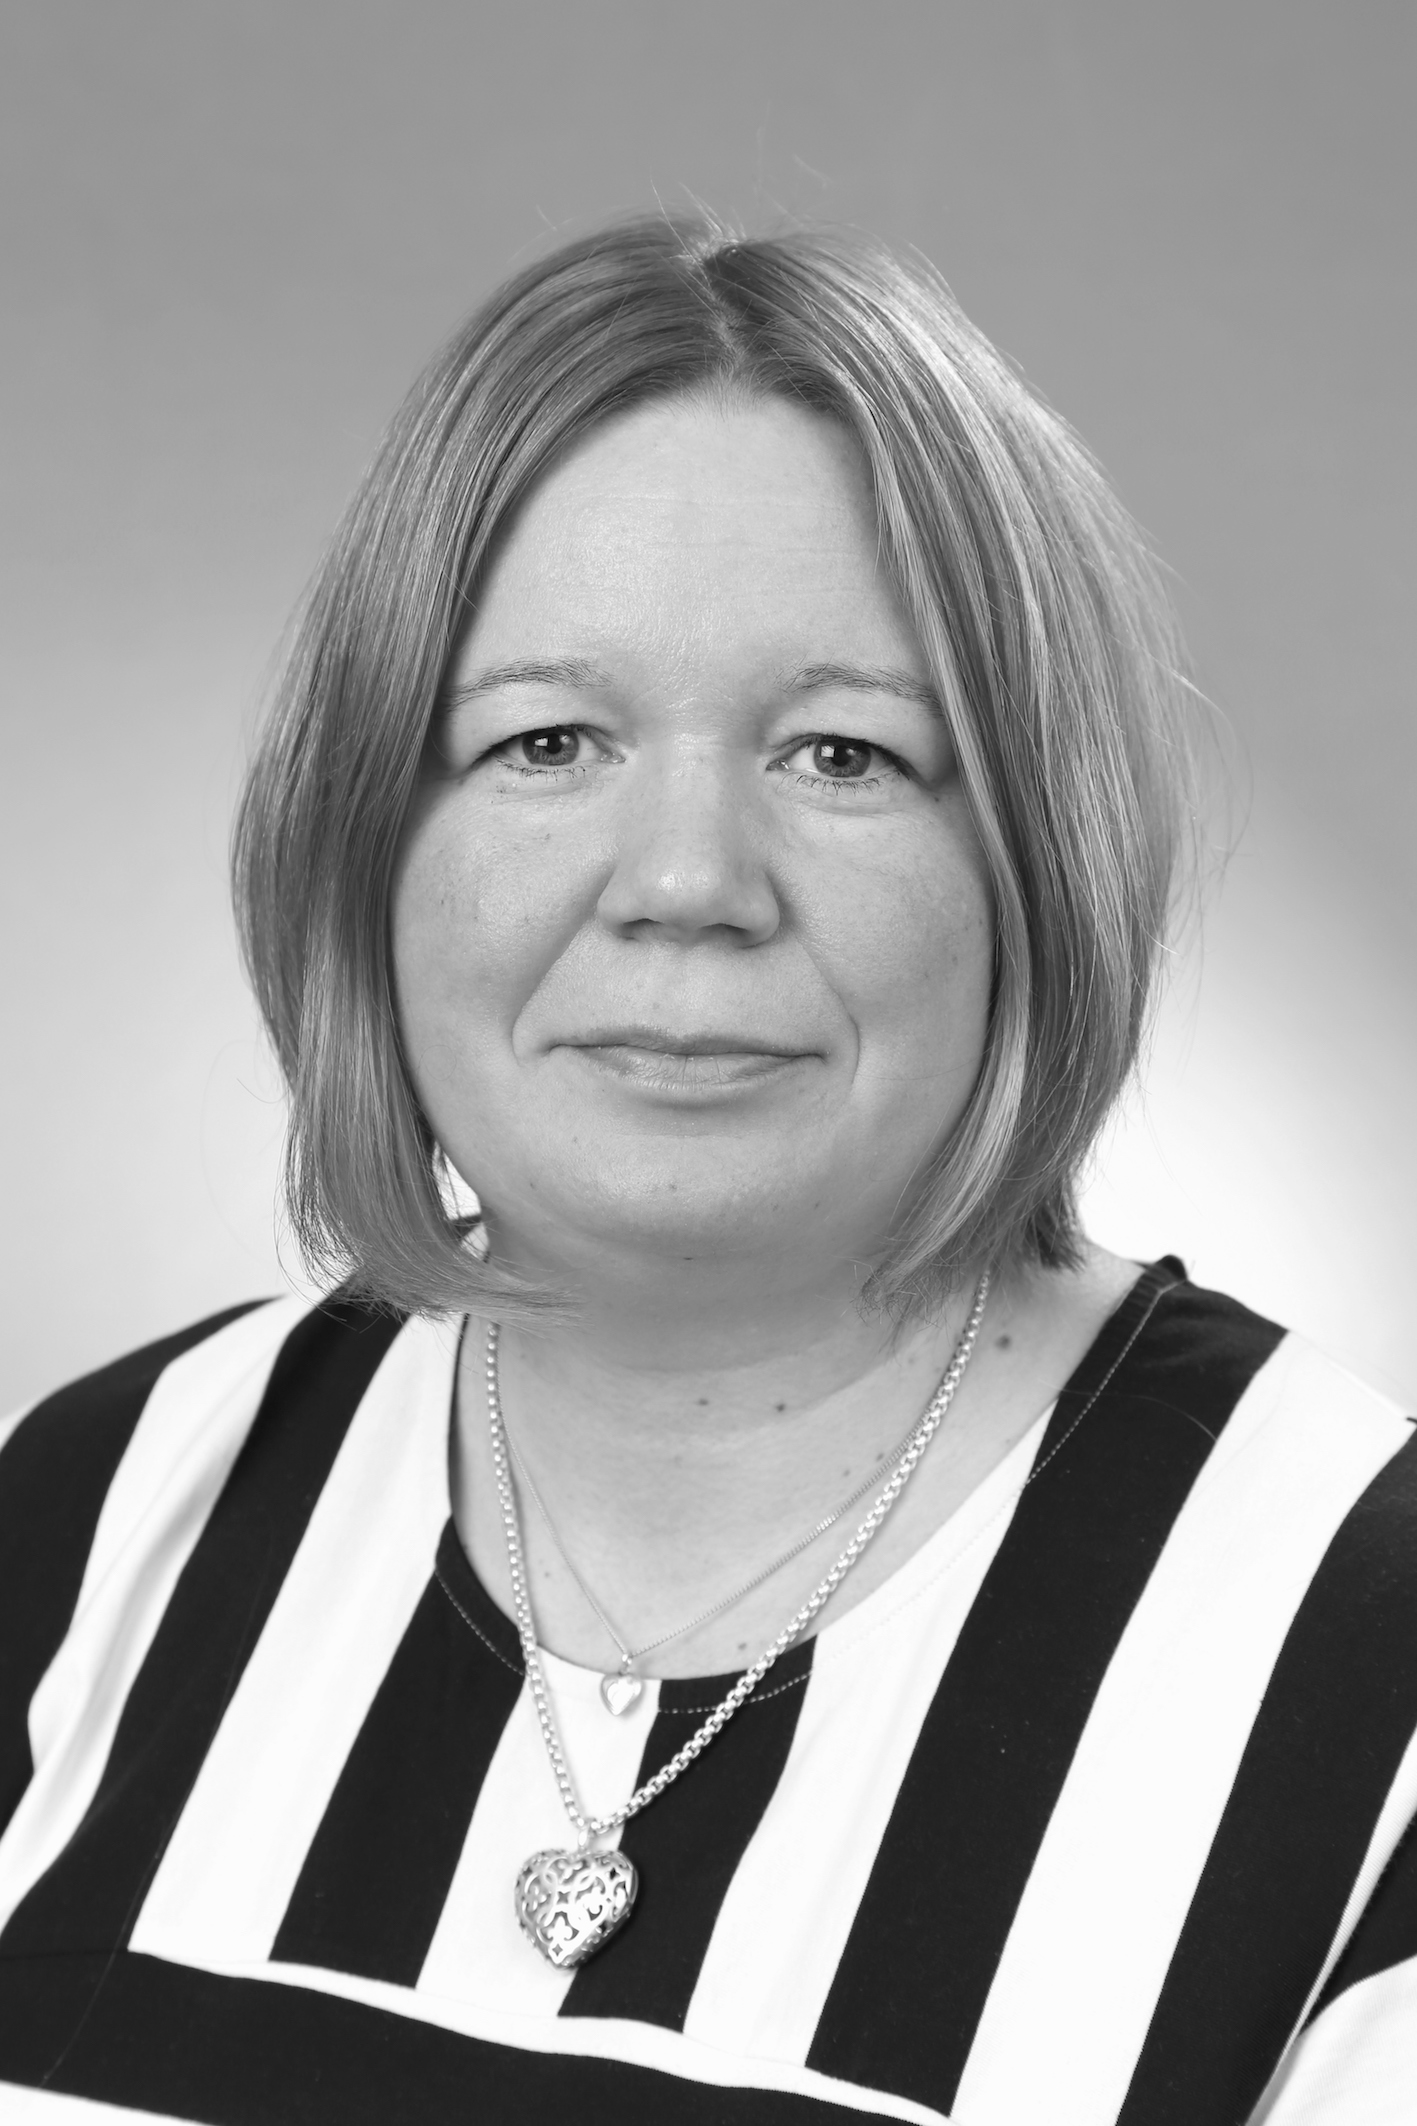 Marja JämsÉn - Asiakaspalvelu